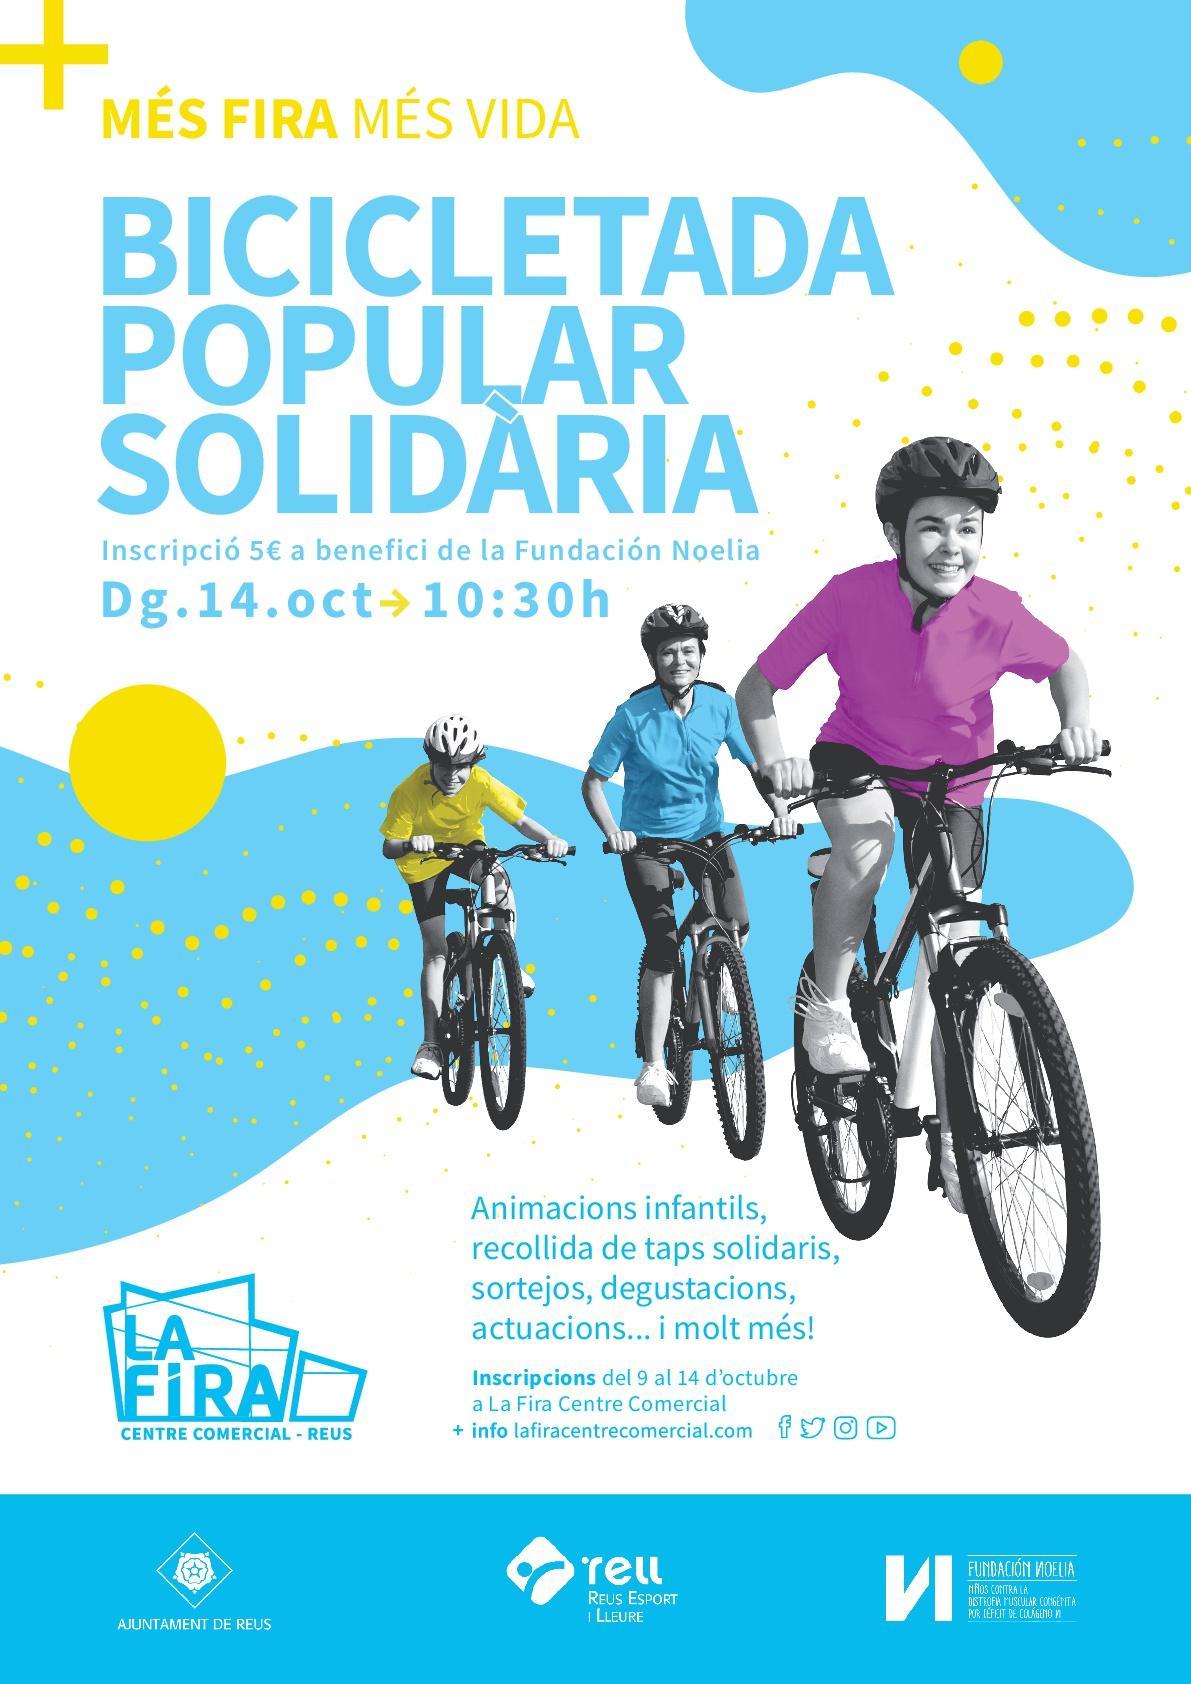 Bicicletada Popular 2018